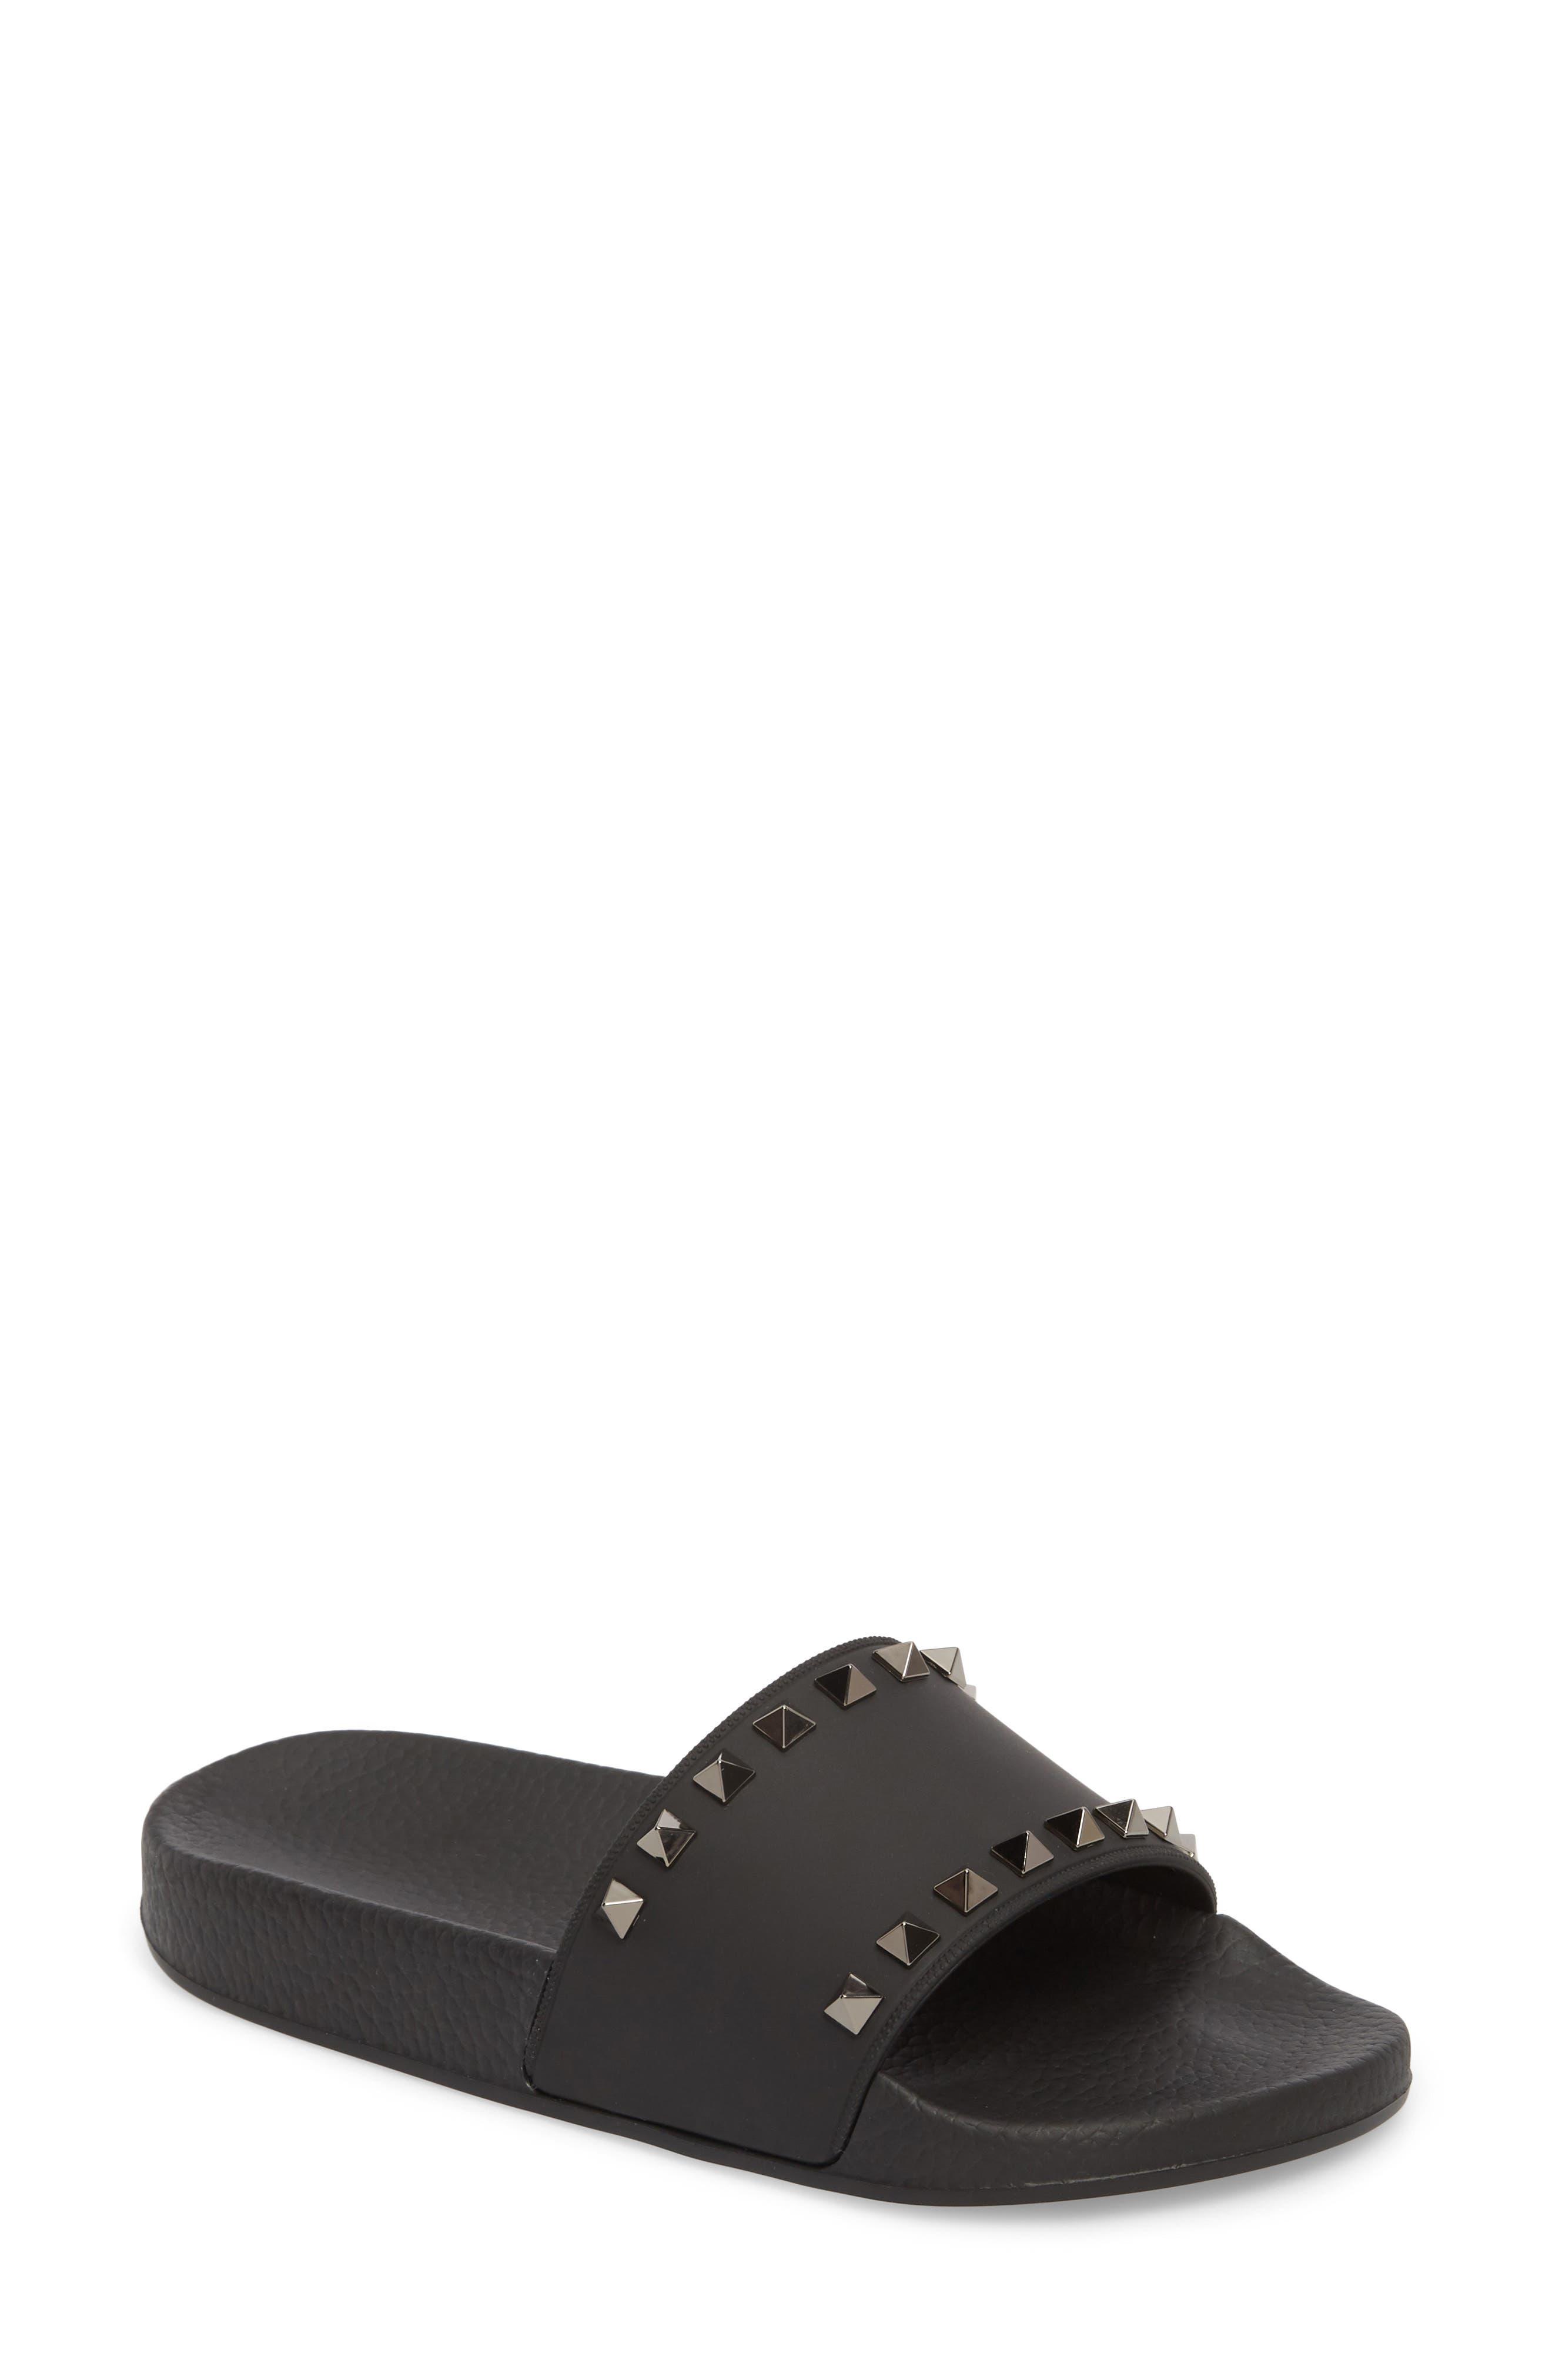 Rockstud Slide Sandal,                         Main,                         color, Nero/ Nero